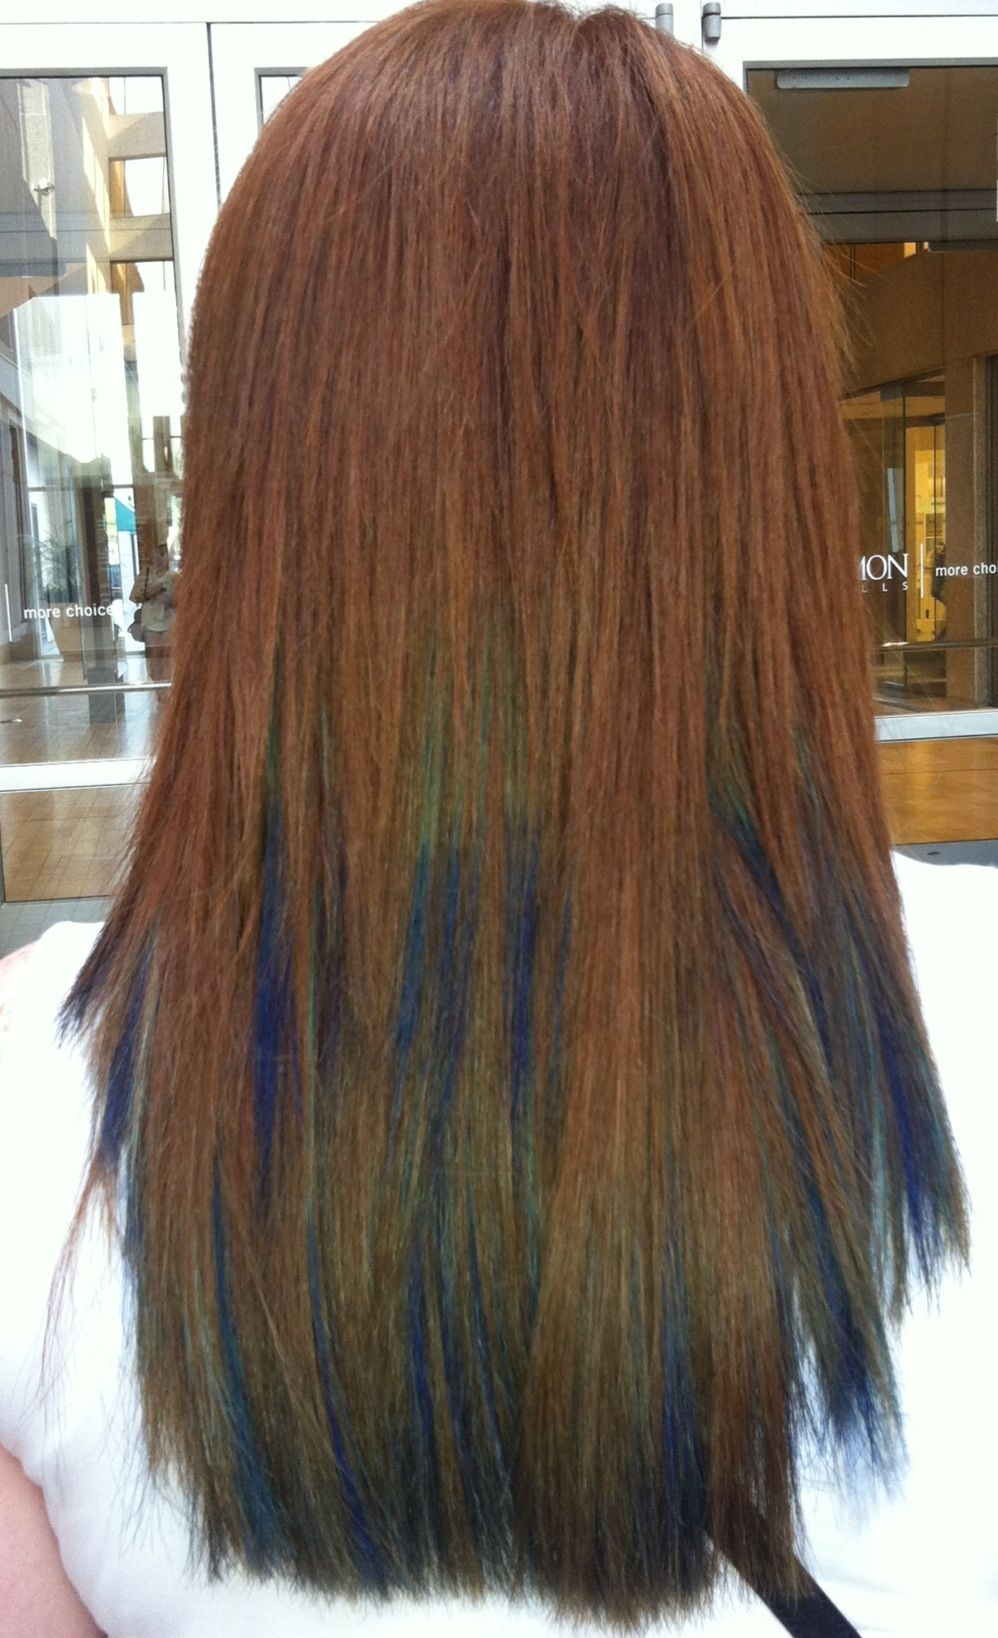 Peacock hair dye blue hair turquoise hair dye ombre hair ombre